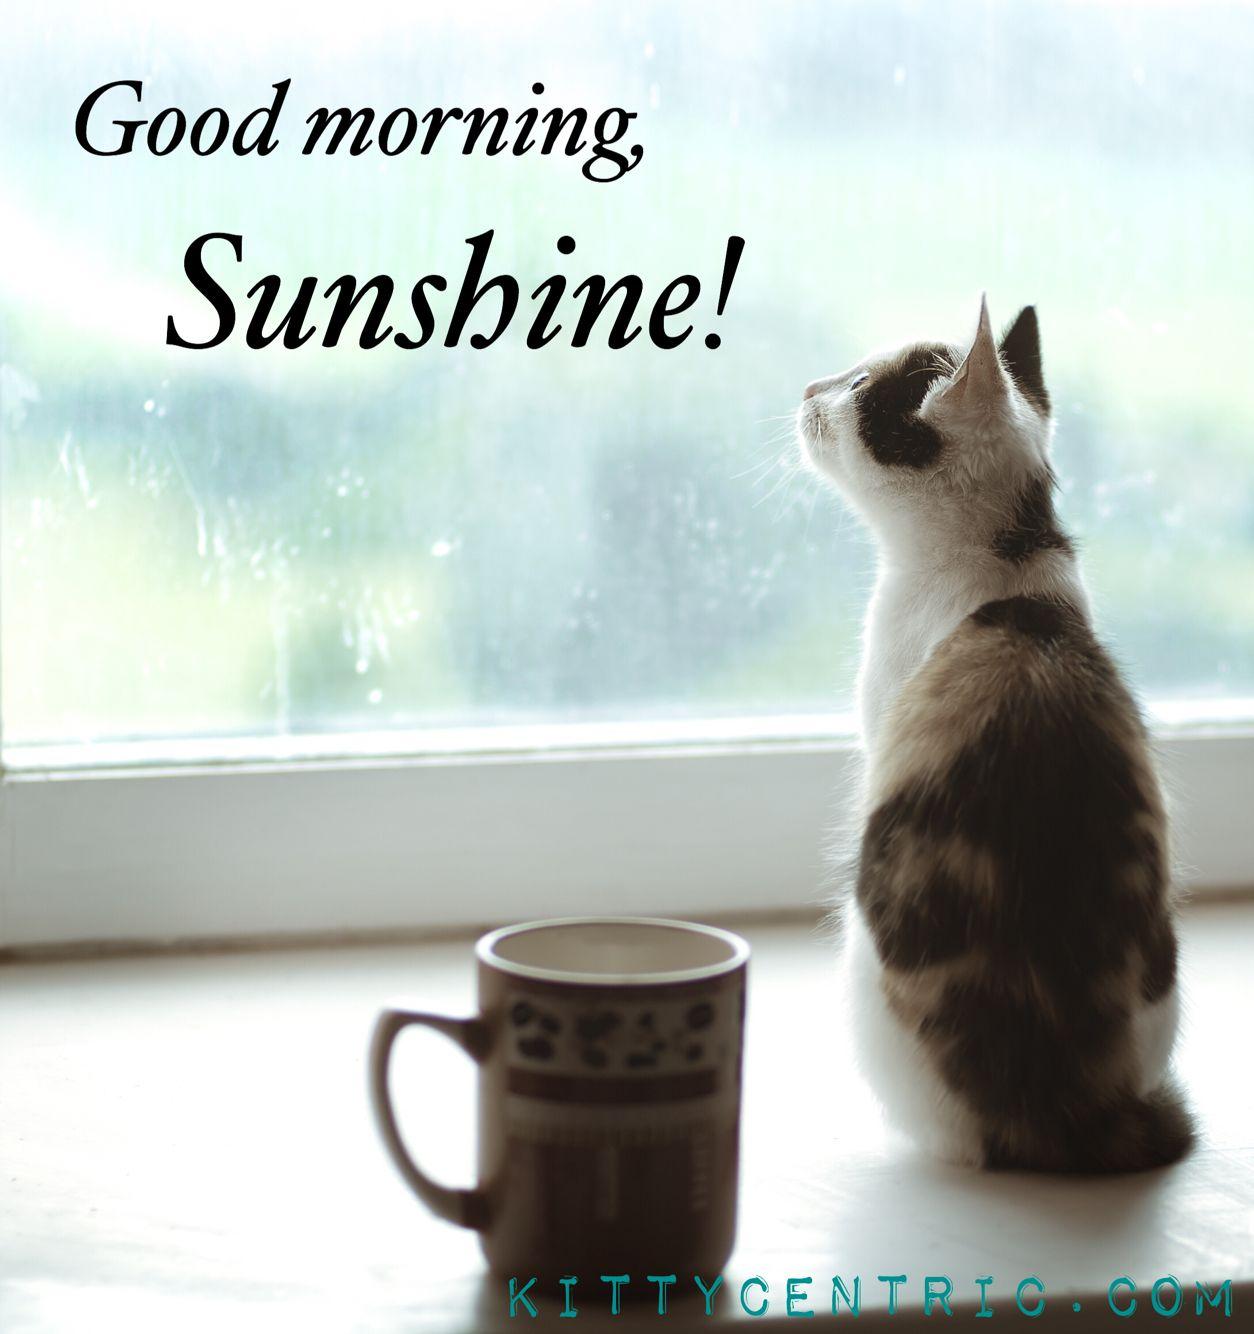 Good Morning Sunshine Cats Cat Catmeme Kittycentric Cats Beautiful Cat Cat Sitting